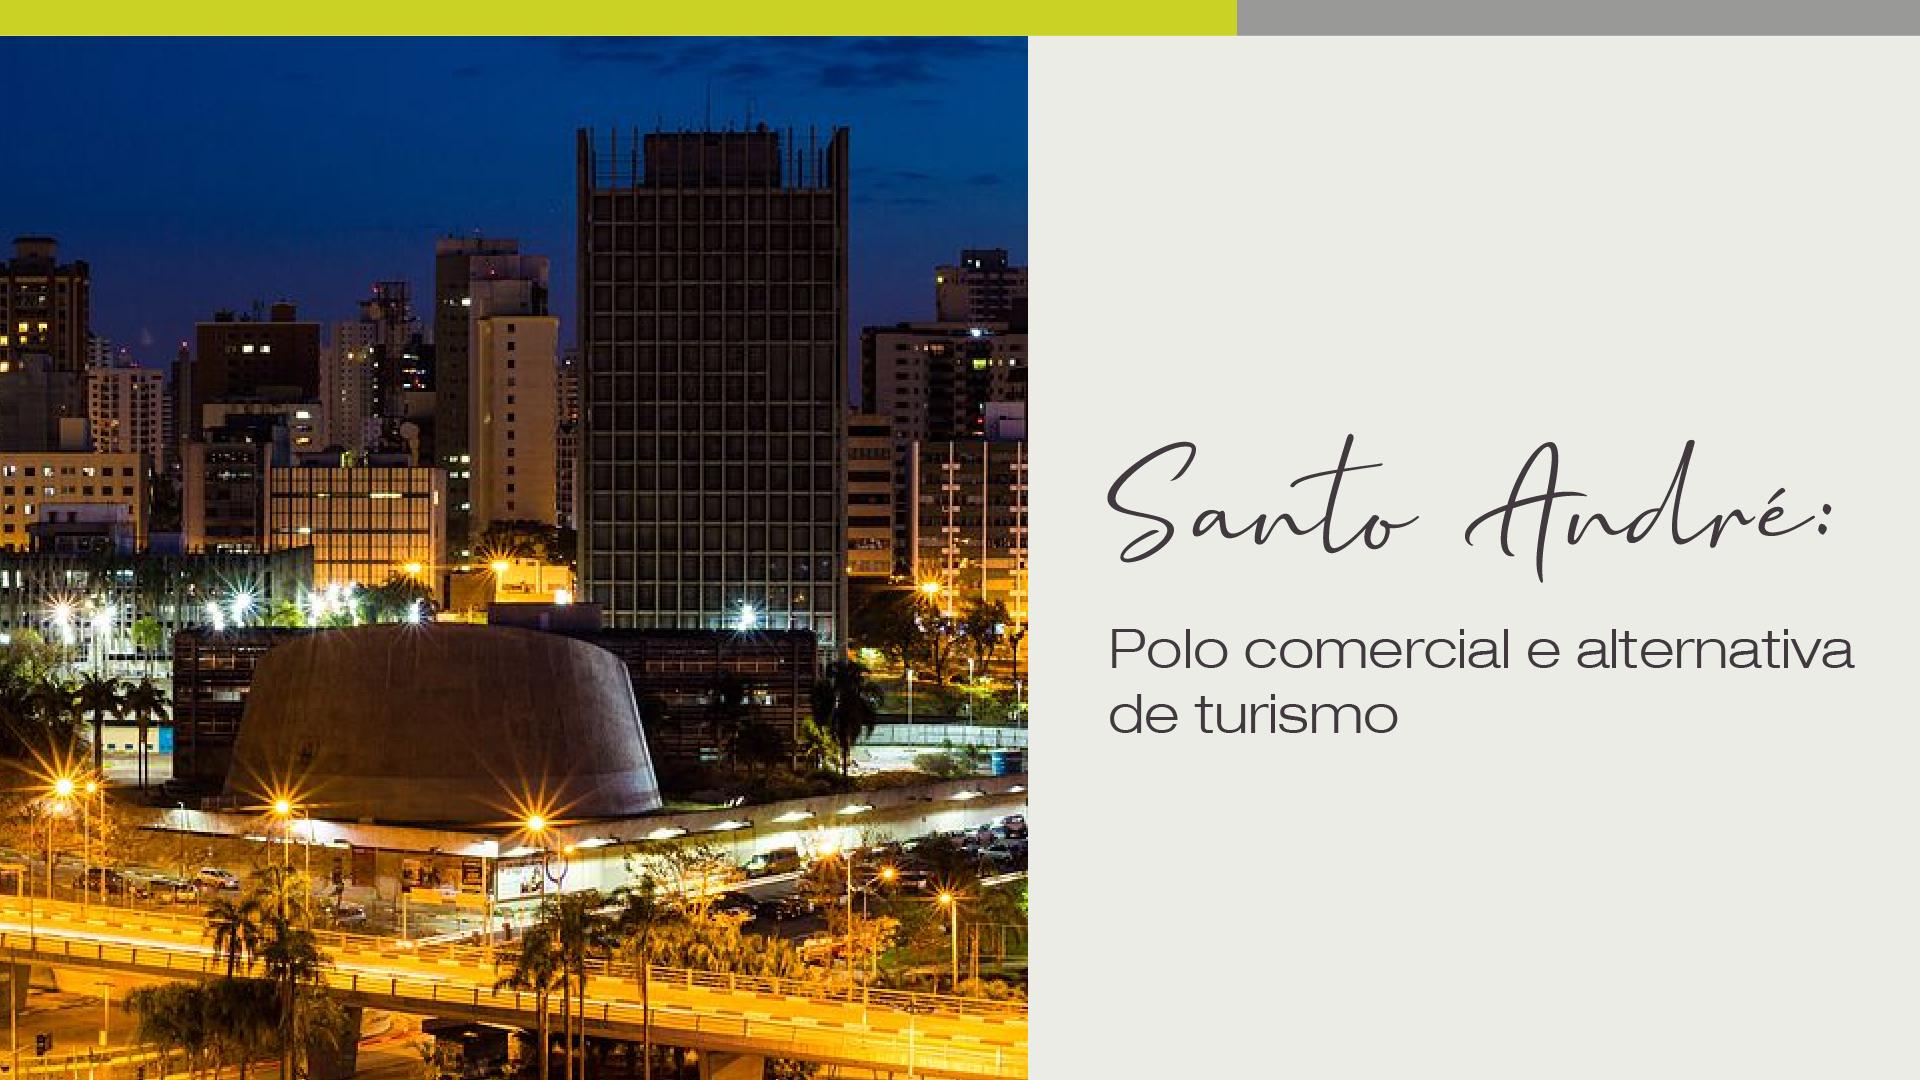 Santo André: polo comercial e alternativa de turismo